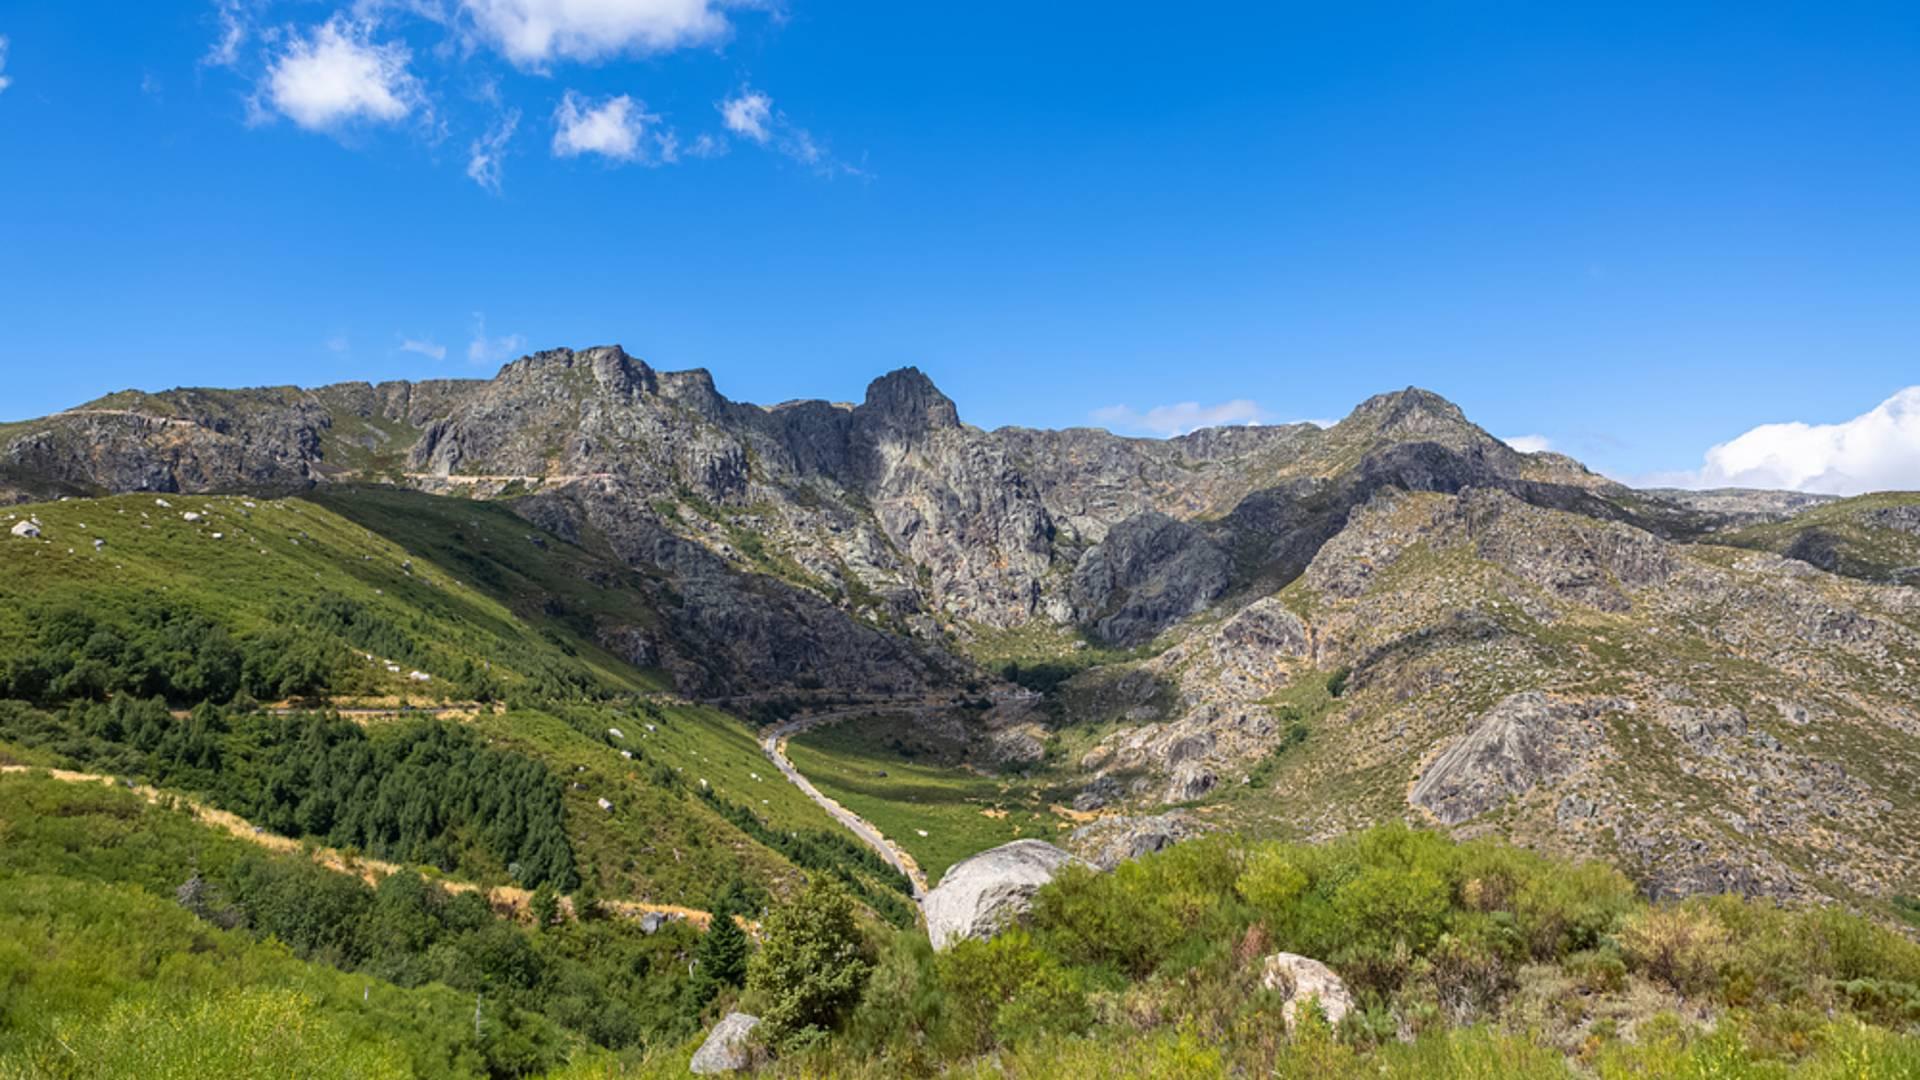 Trekking tra i sentieri della Serra da Estrela